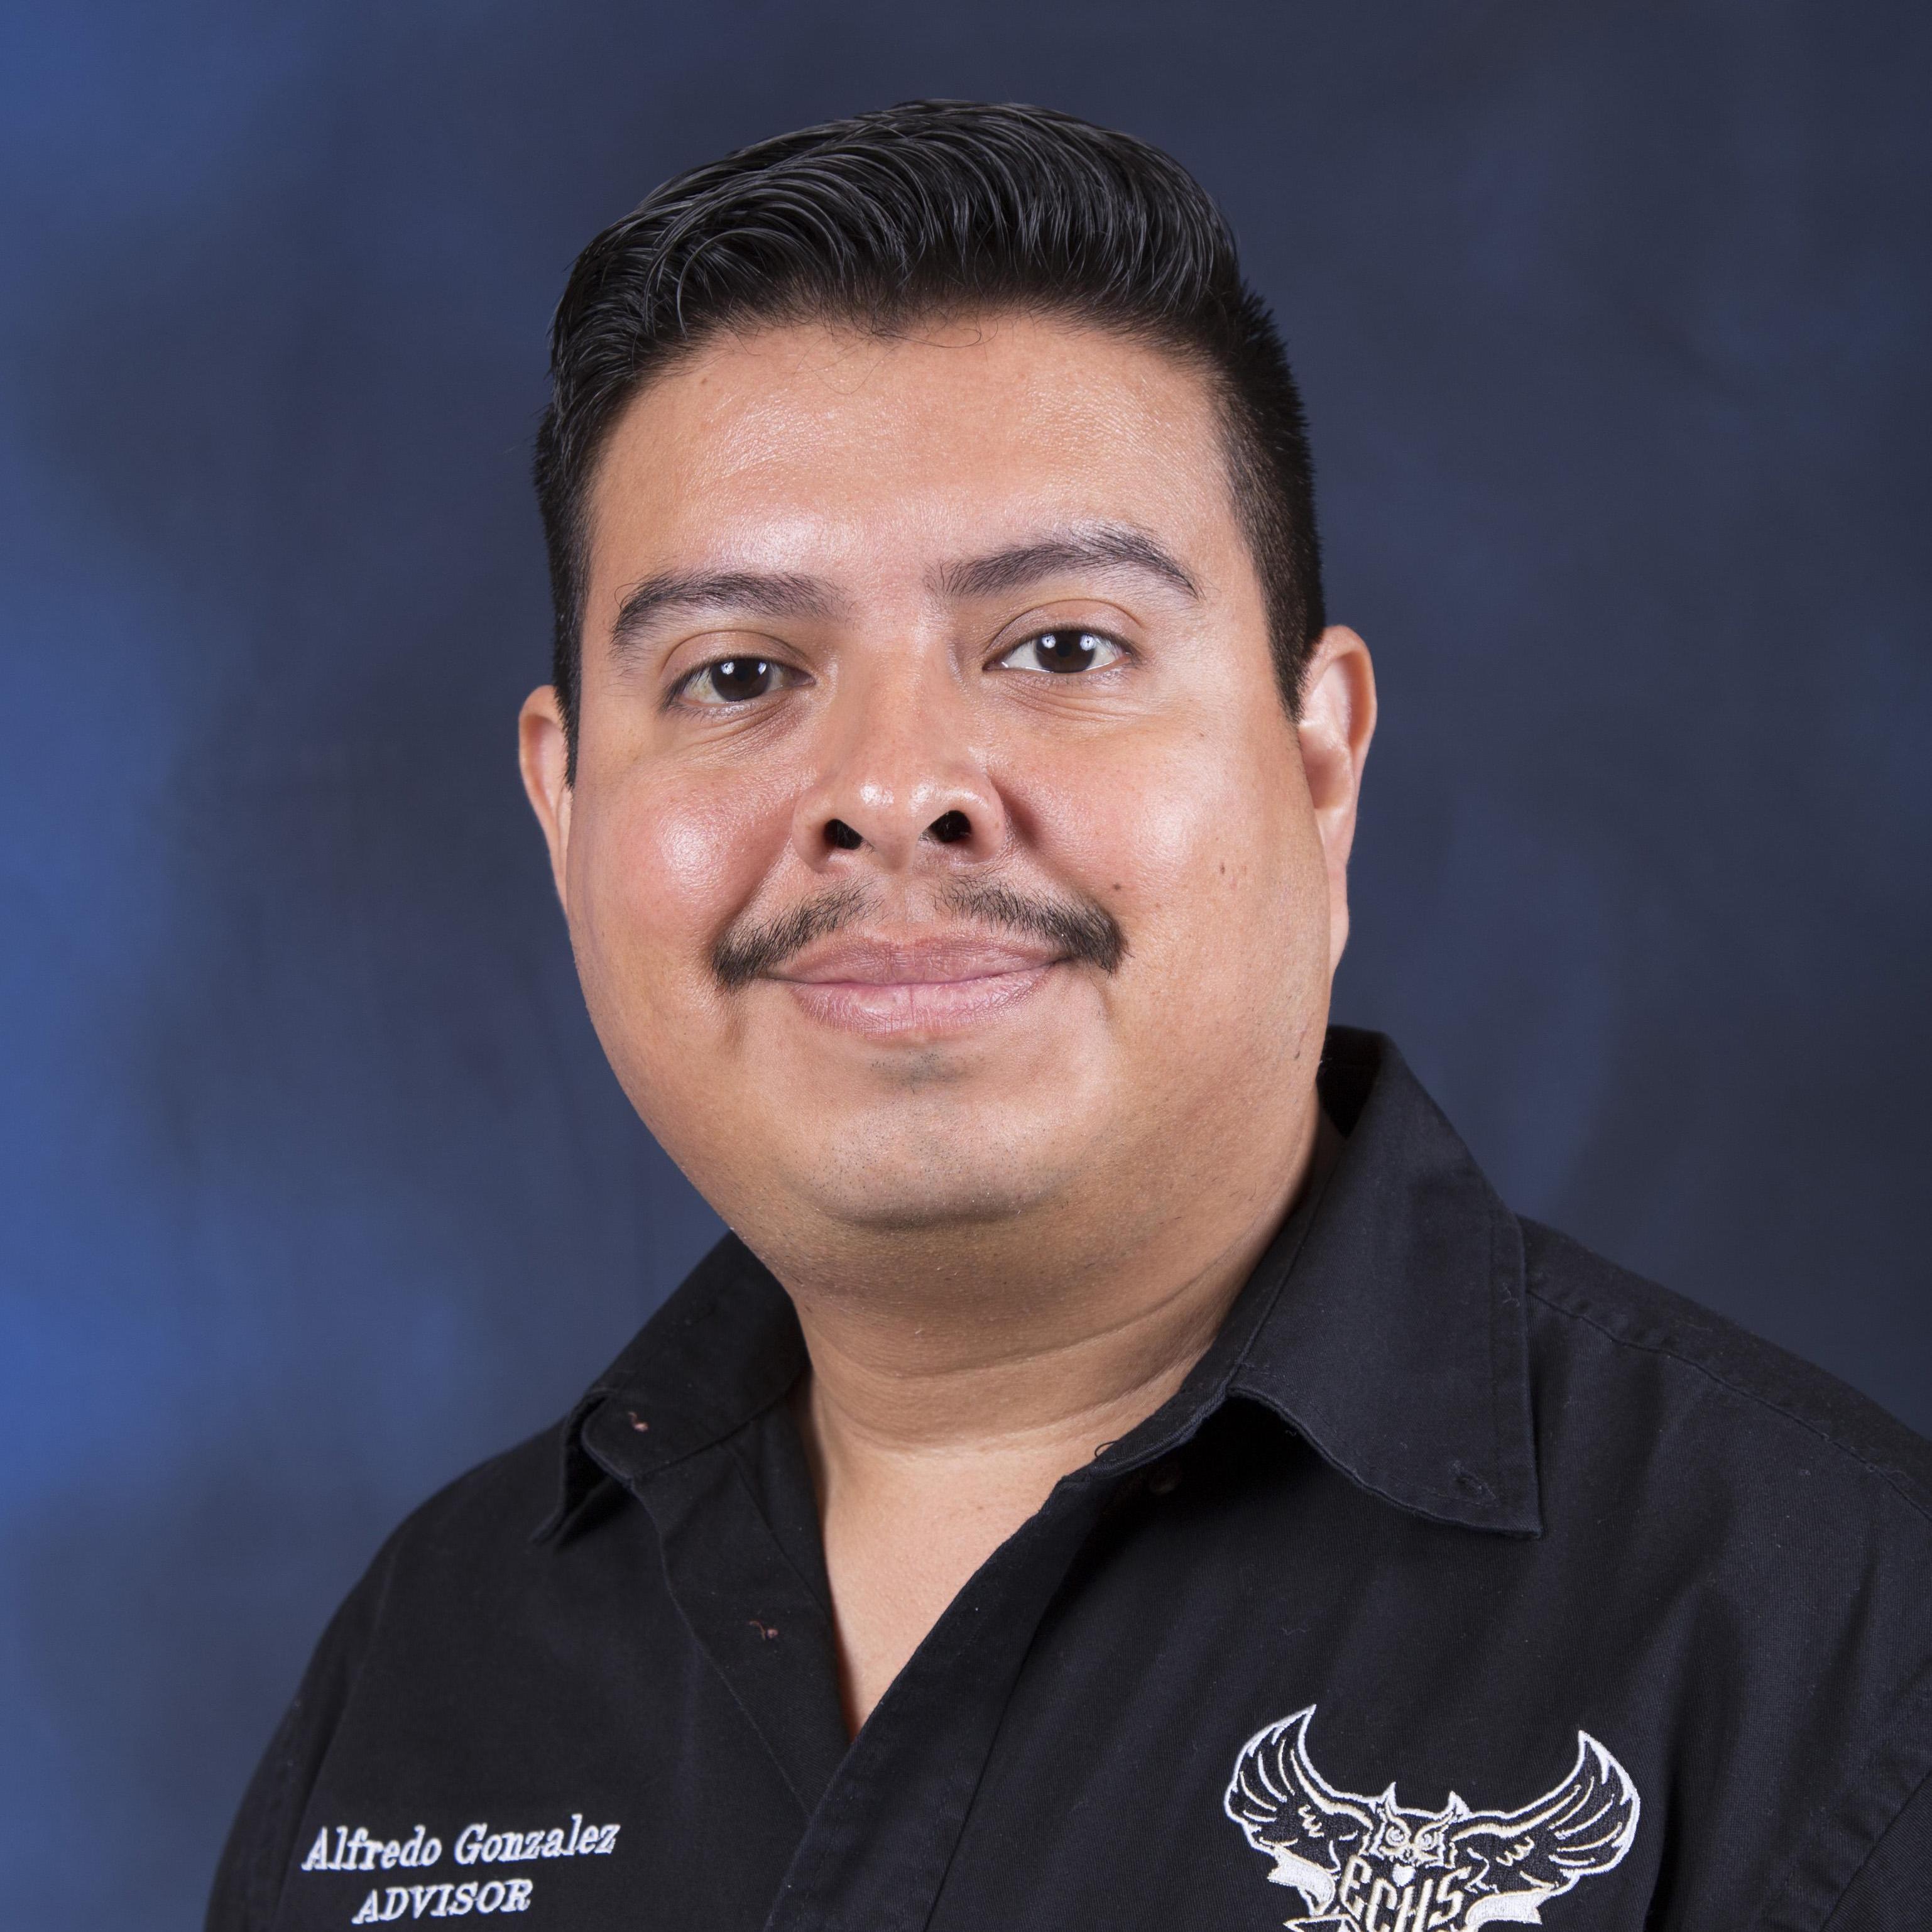 Alfredo Gonzalez's Profile Photo